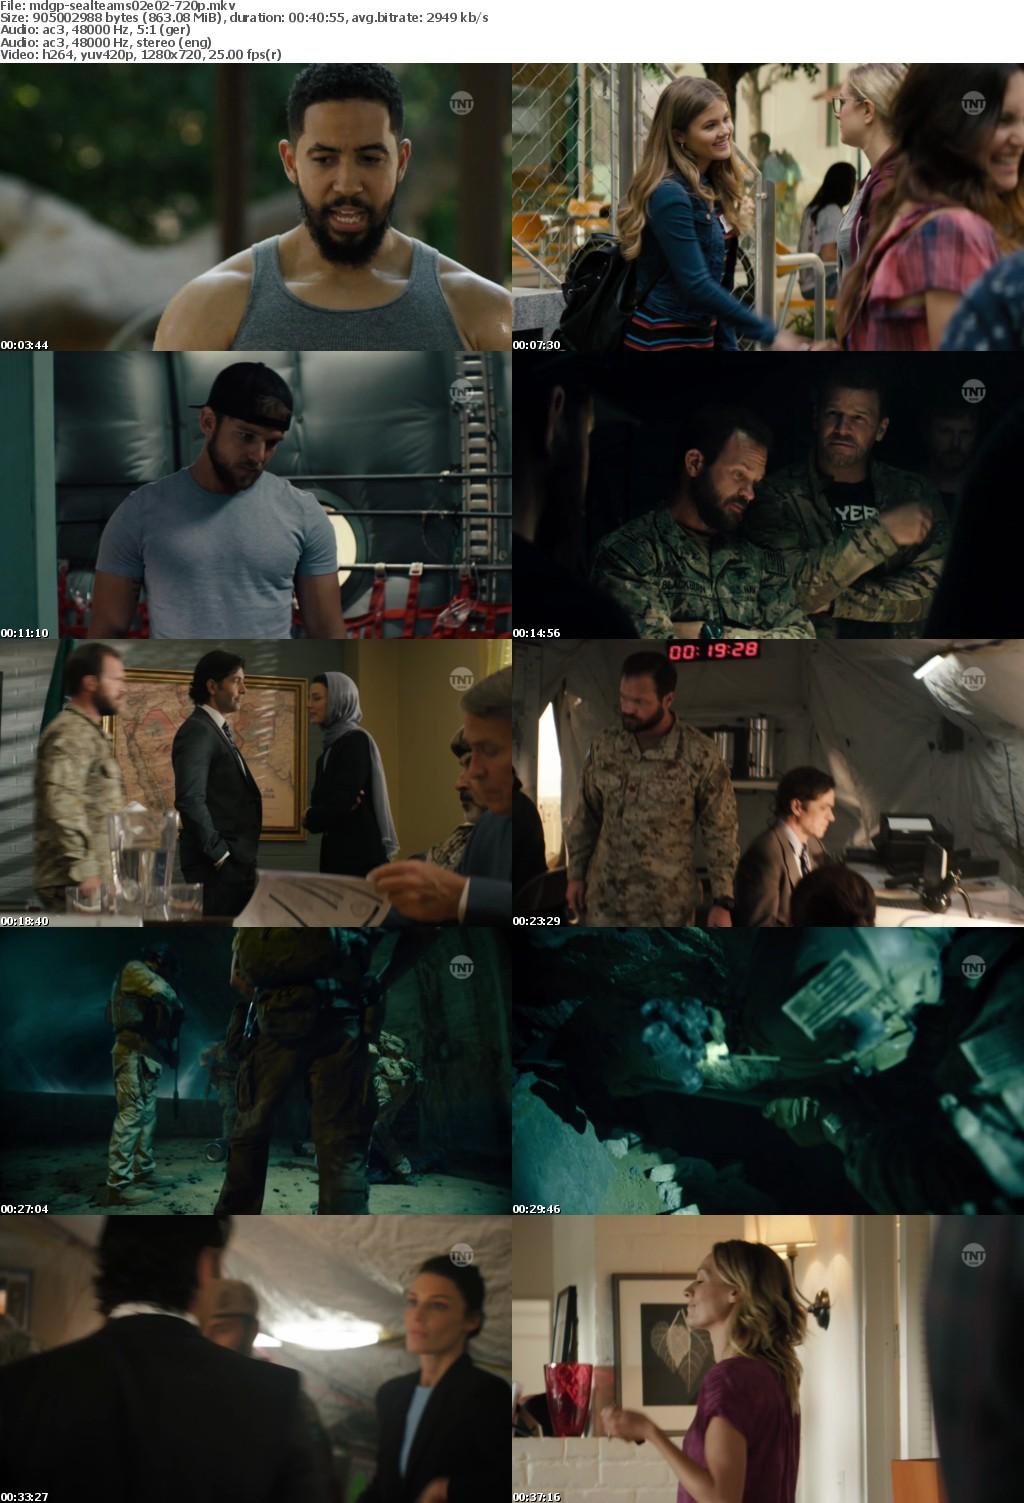 SEAL Team S02E02 Giftiges Wasser GERMAN DL 720p HDTV x264-MDGP